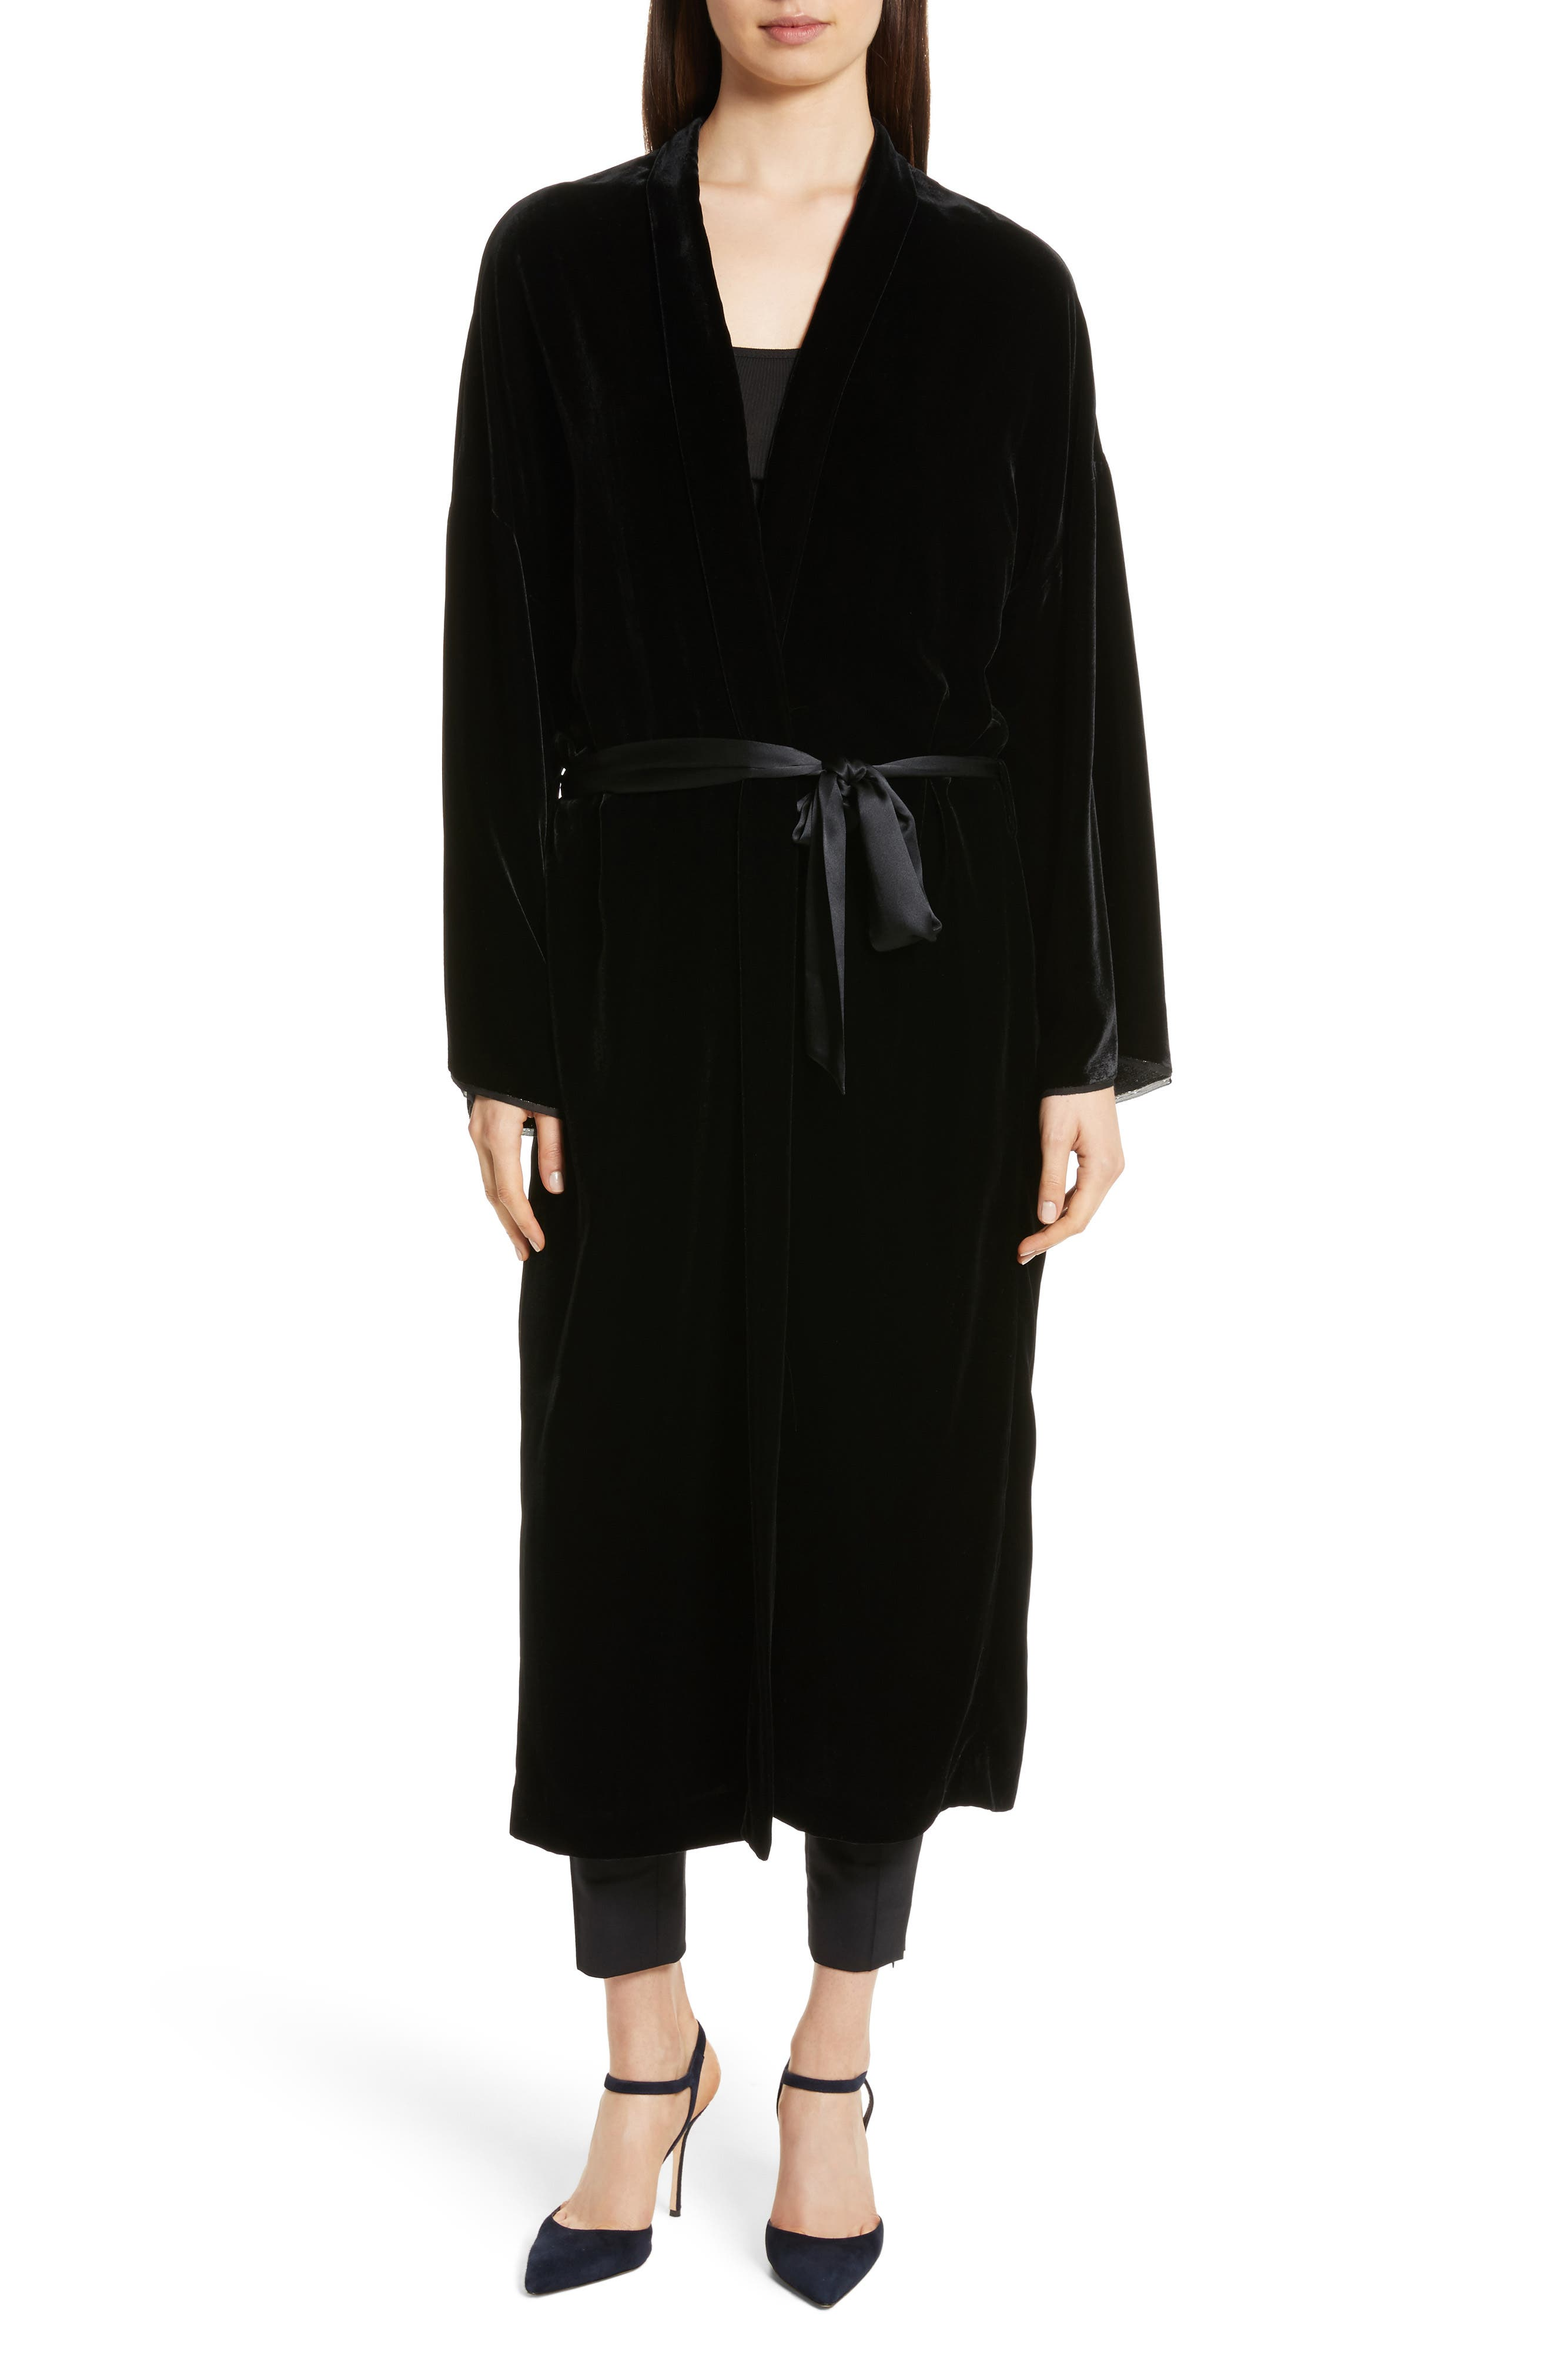 Muna Velvet Kimono,                         Main,                         color, Black